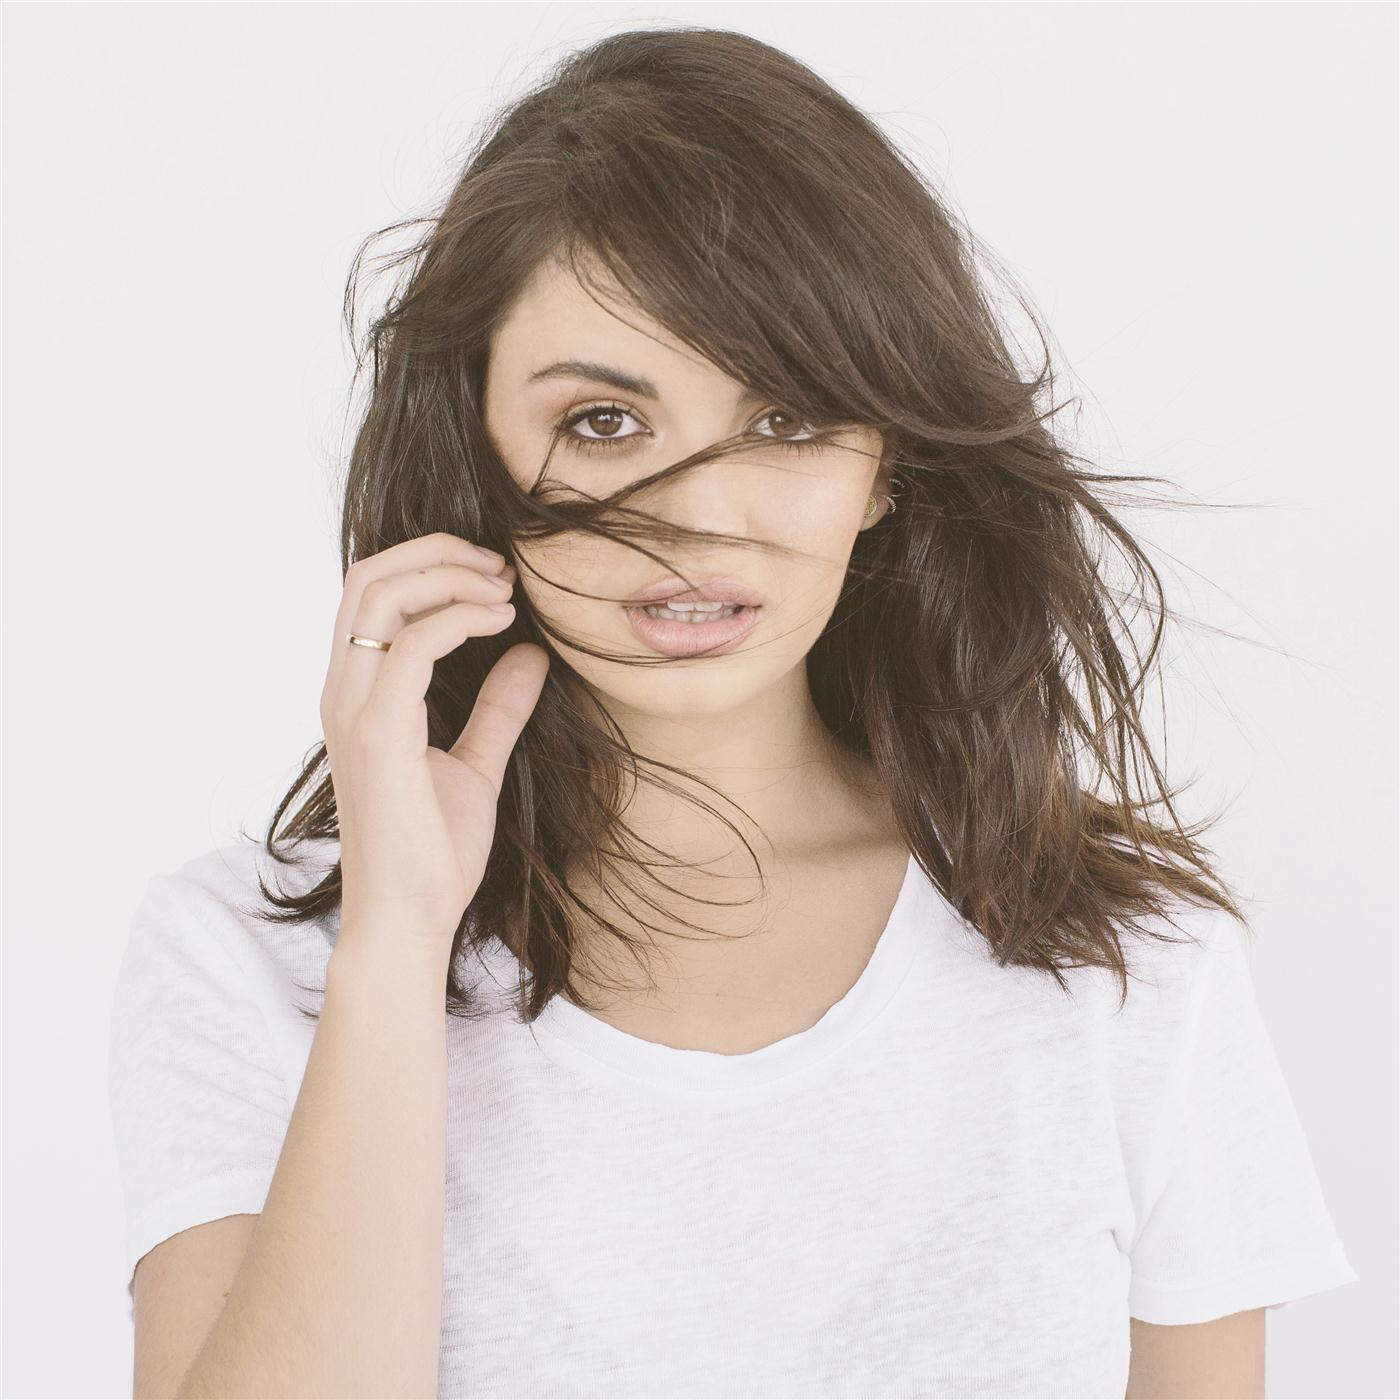 Rebecca Black - The Great Divide (Crash Cove Remix) - Single Cover